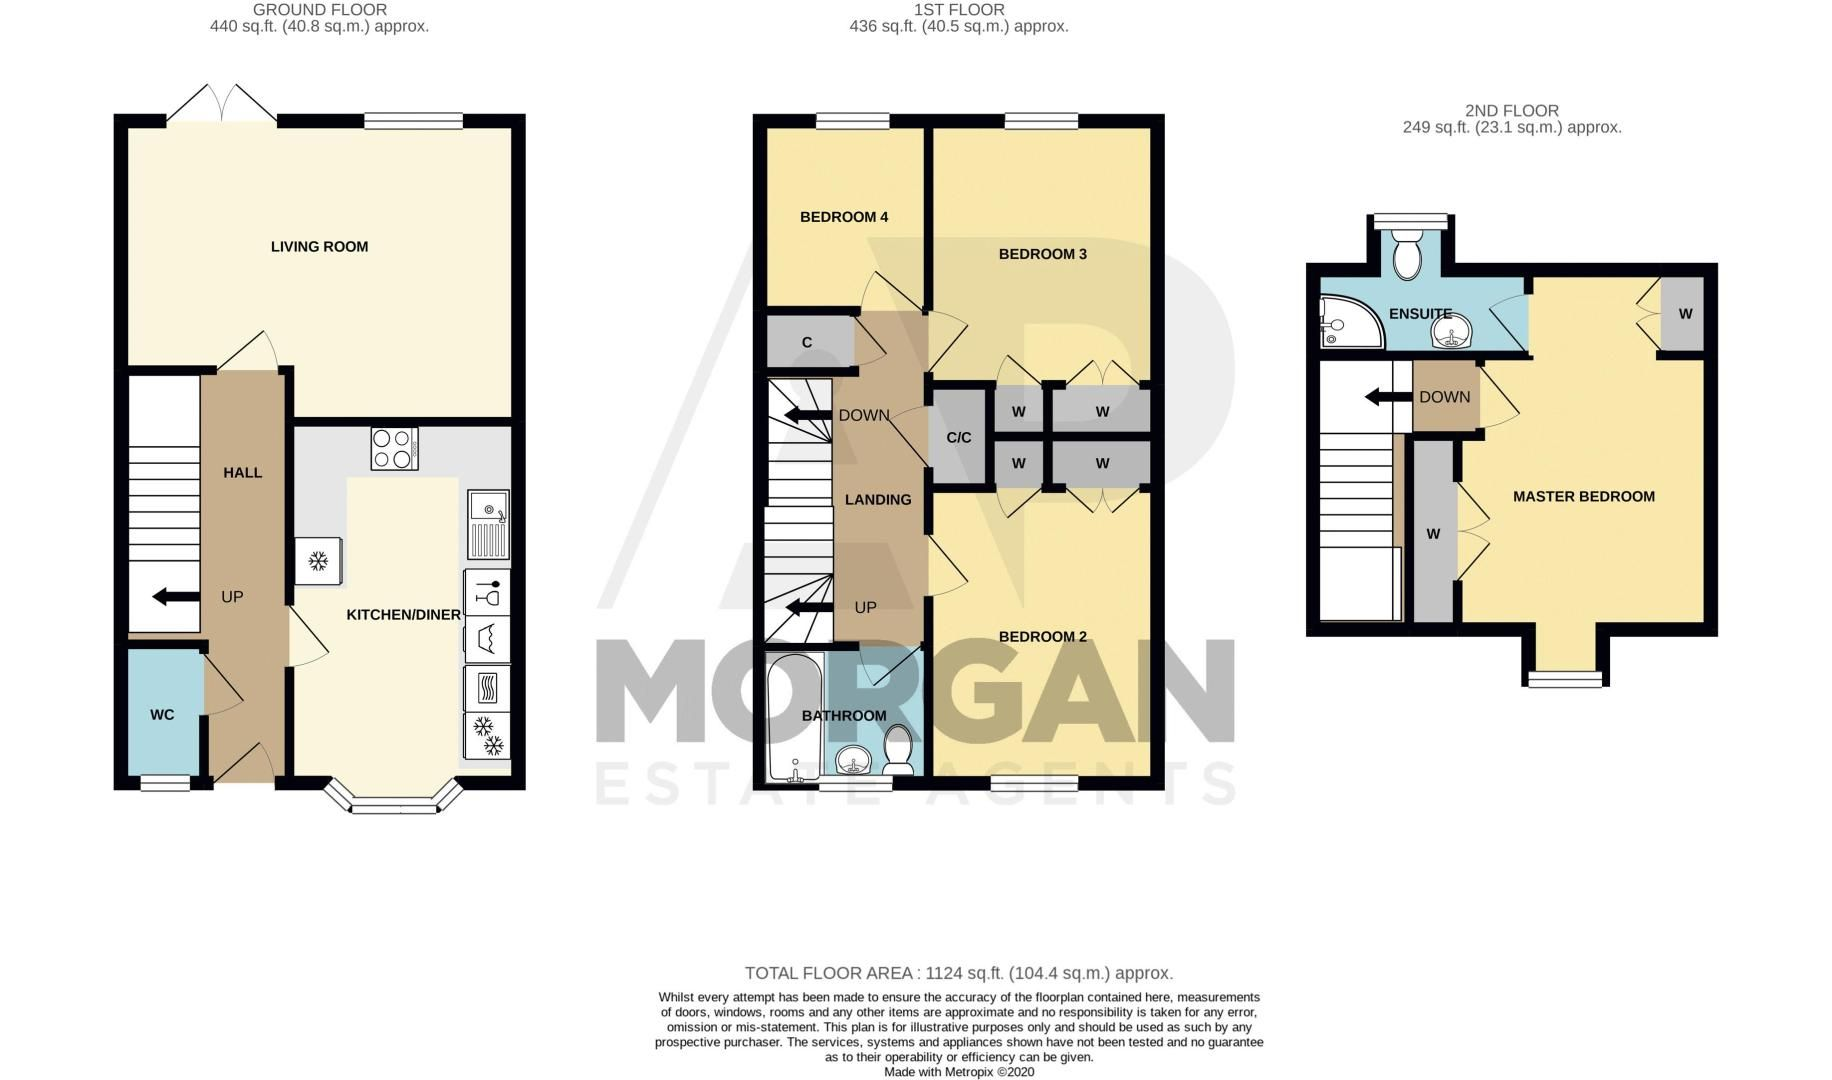 4 bed  for sale in Garrick Road - Property Floorplan